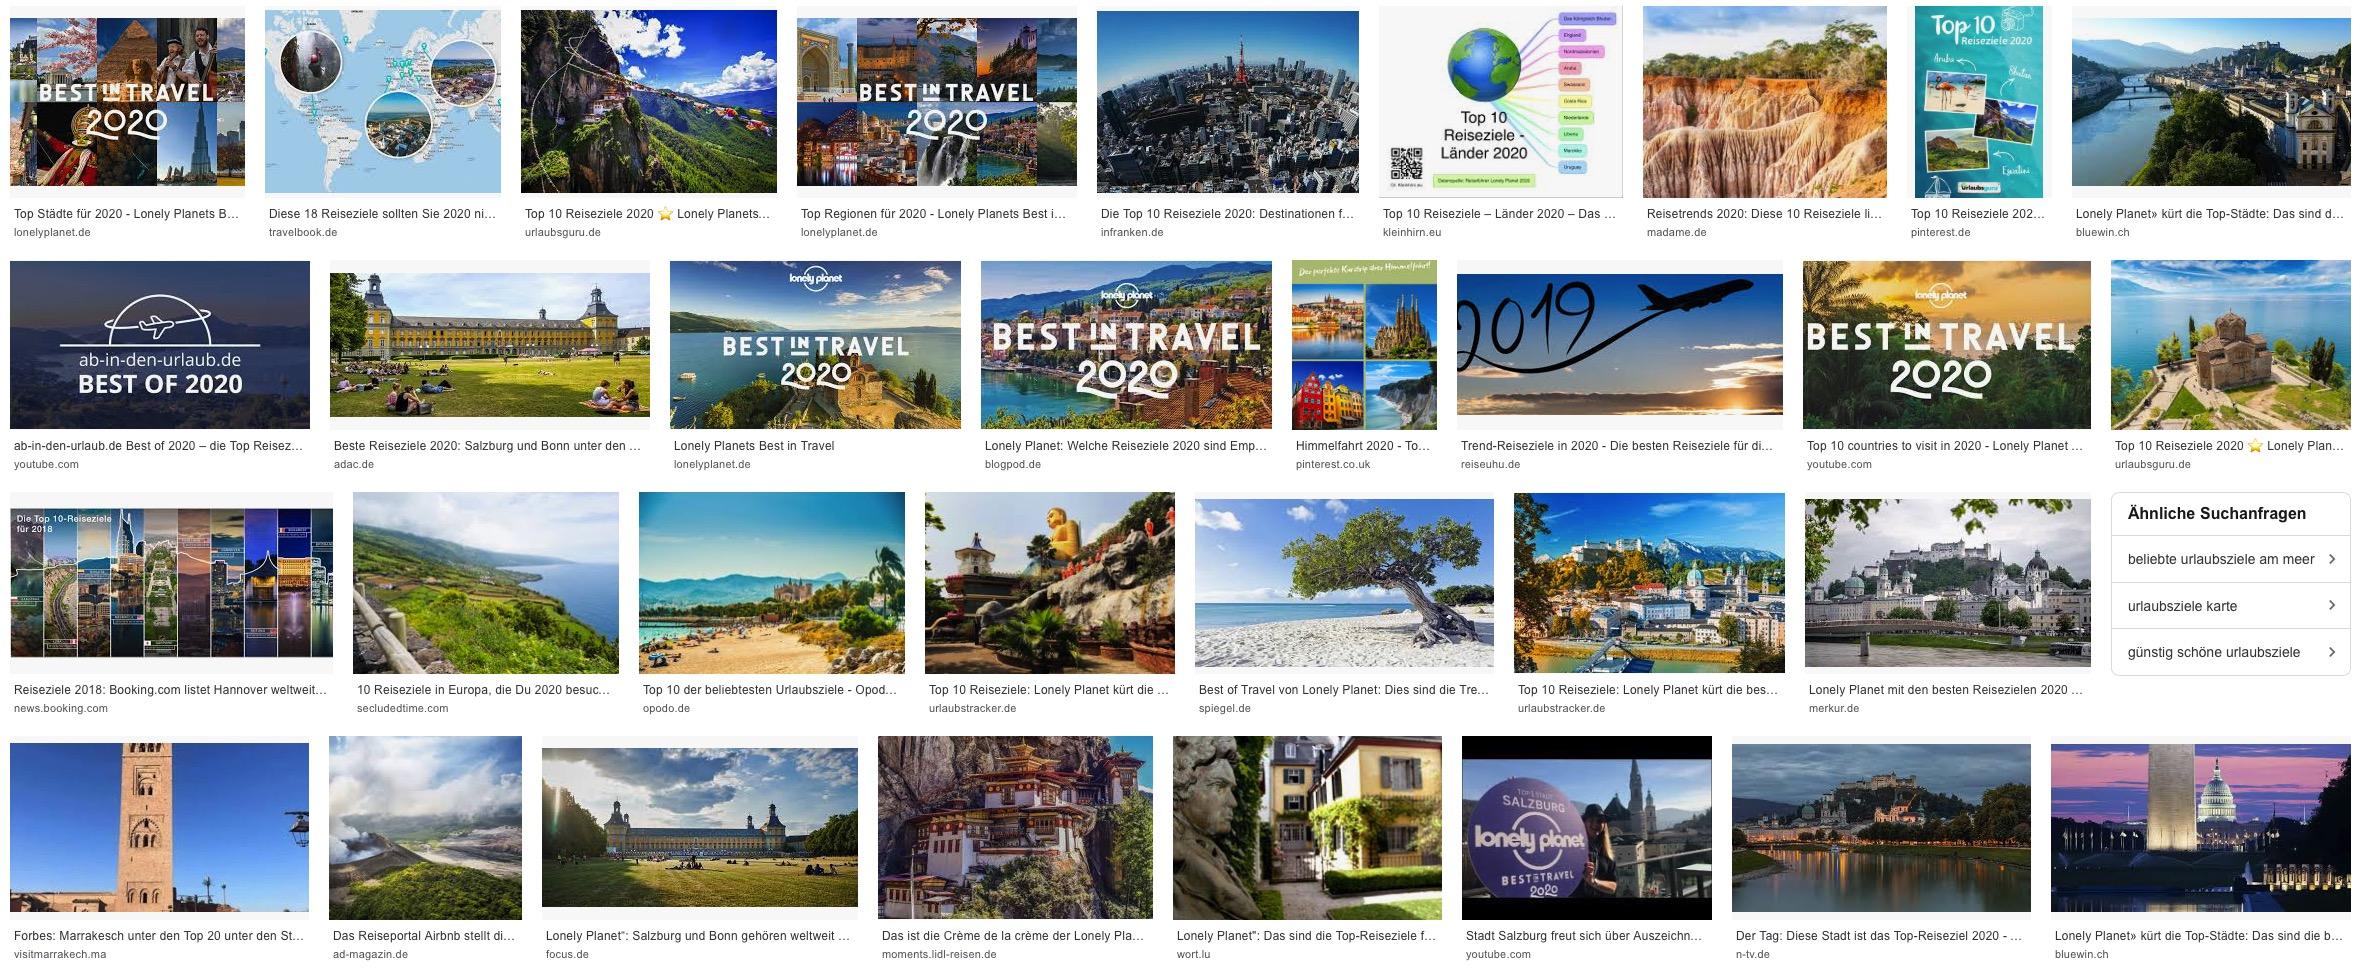 Top Ten Reiseziele